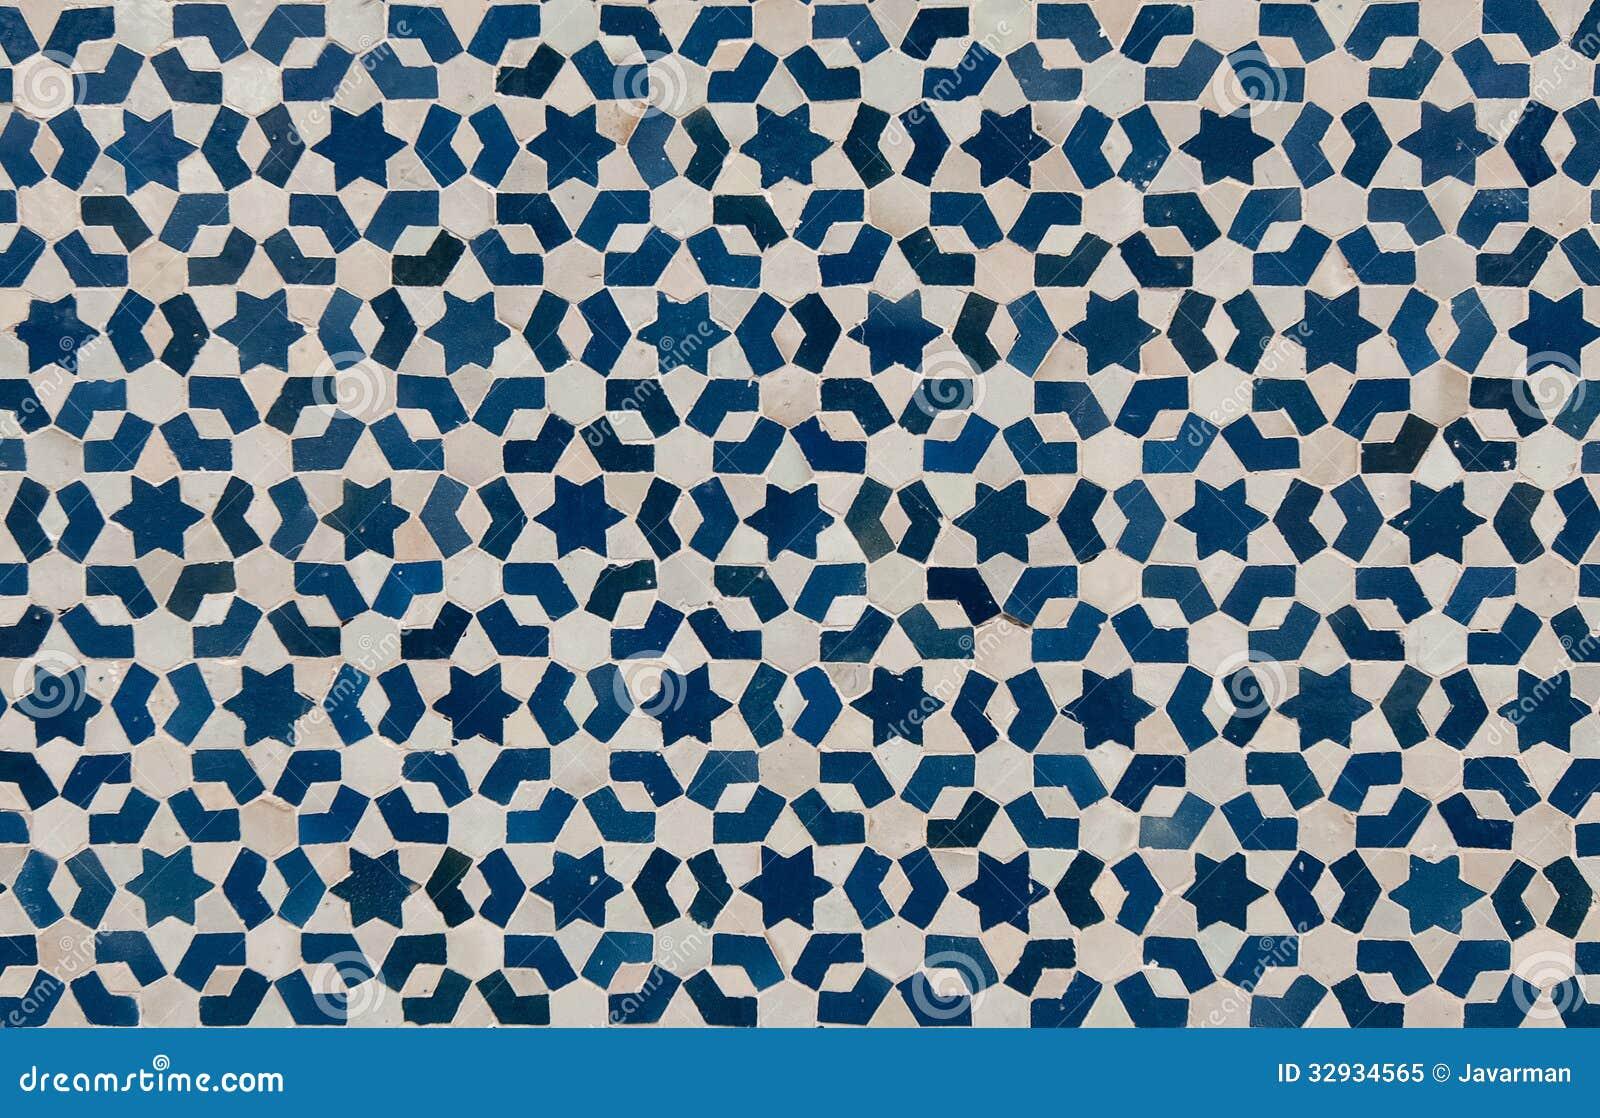 Moroccan Vintage Tile Background Stock Image Image 32934565